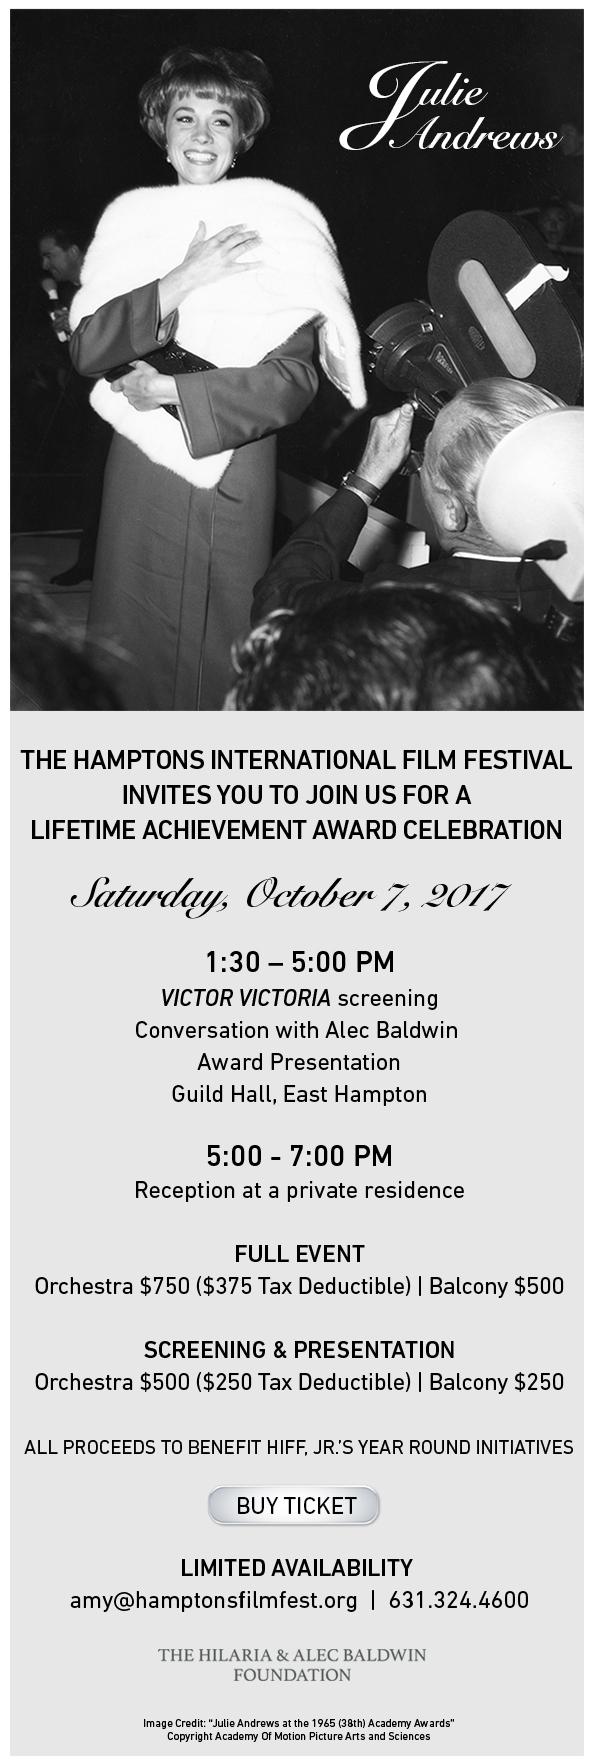 Julie Andrews invite revised